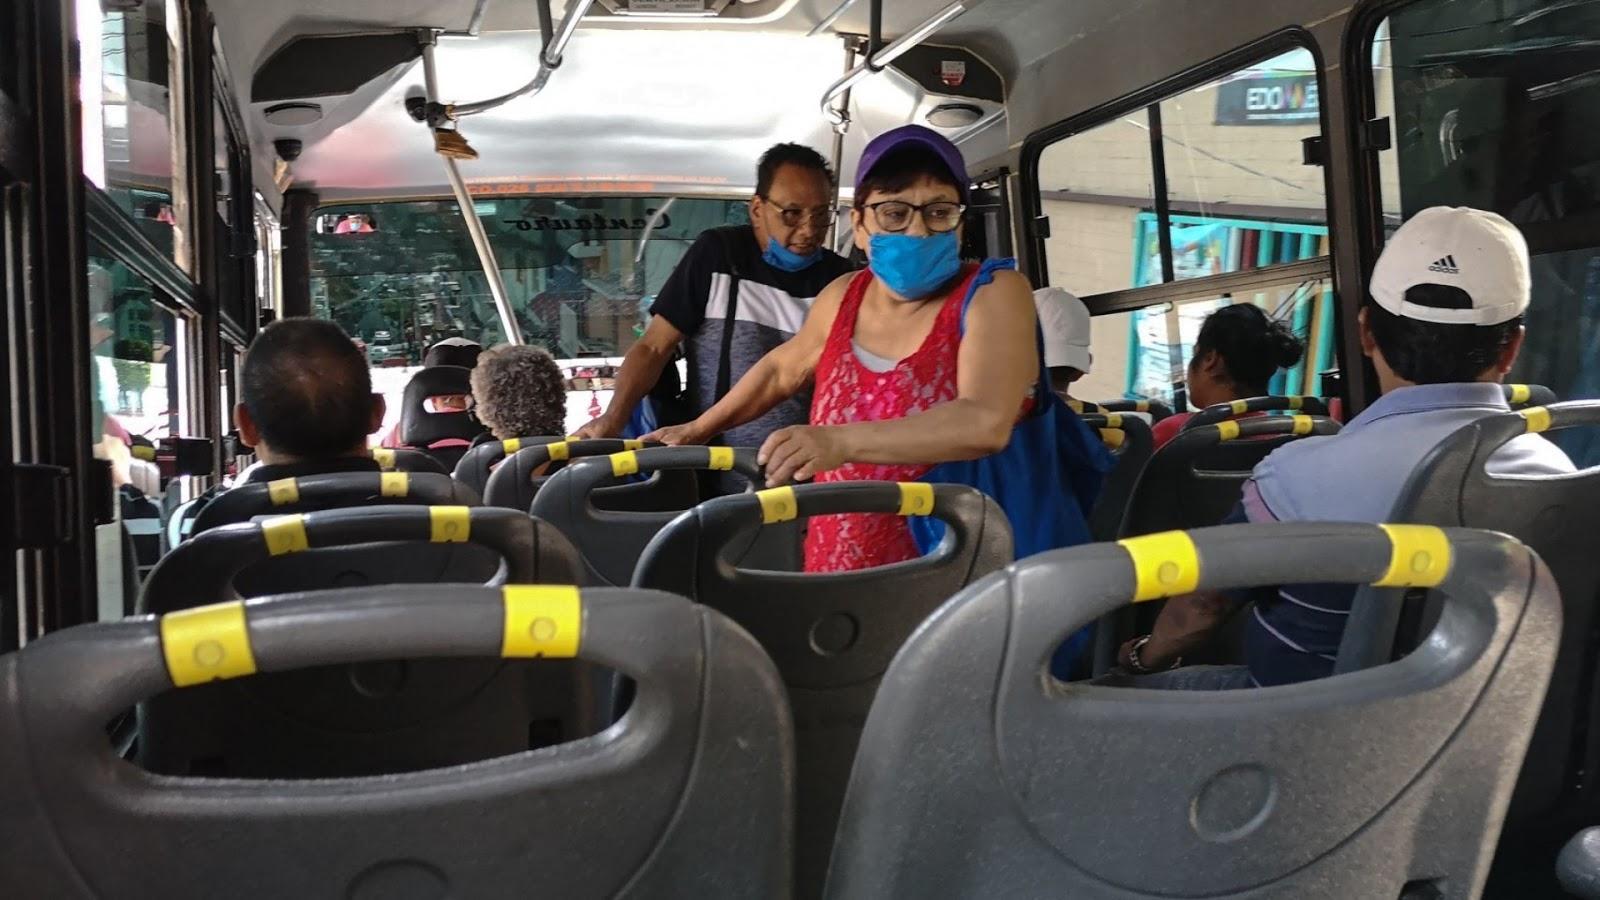 9 operadores de transporte público de Cancún han fallecido por Covid-19 |  Informador QR | Noticias Cancún